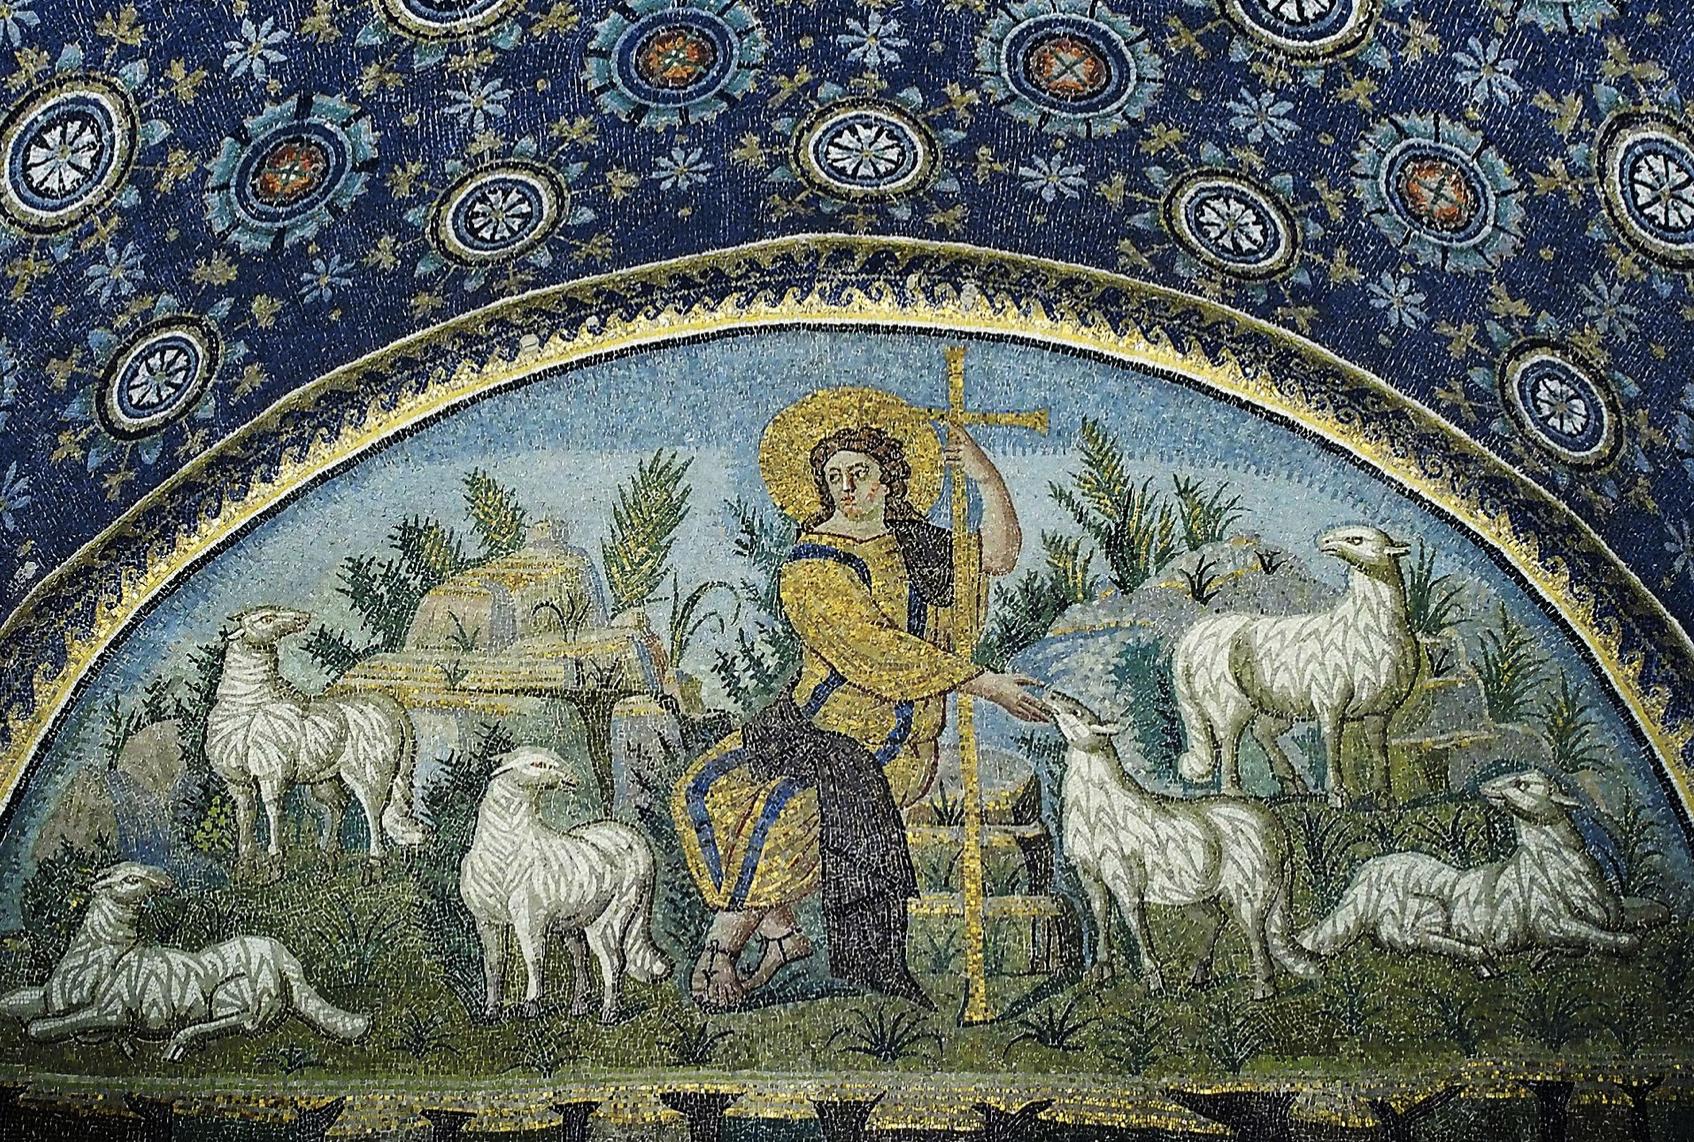 Christ the Good Shepherd.  Mausoleum of Galla Placidia, Ravenna. 5th century.